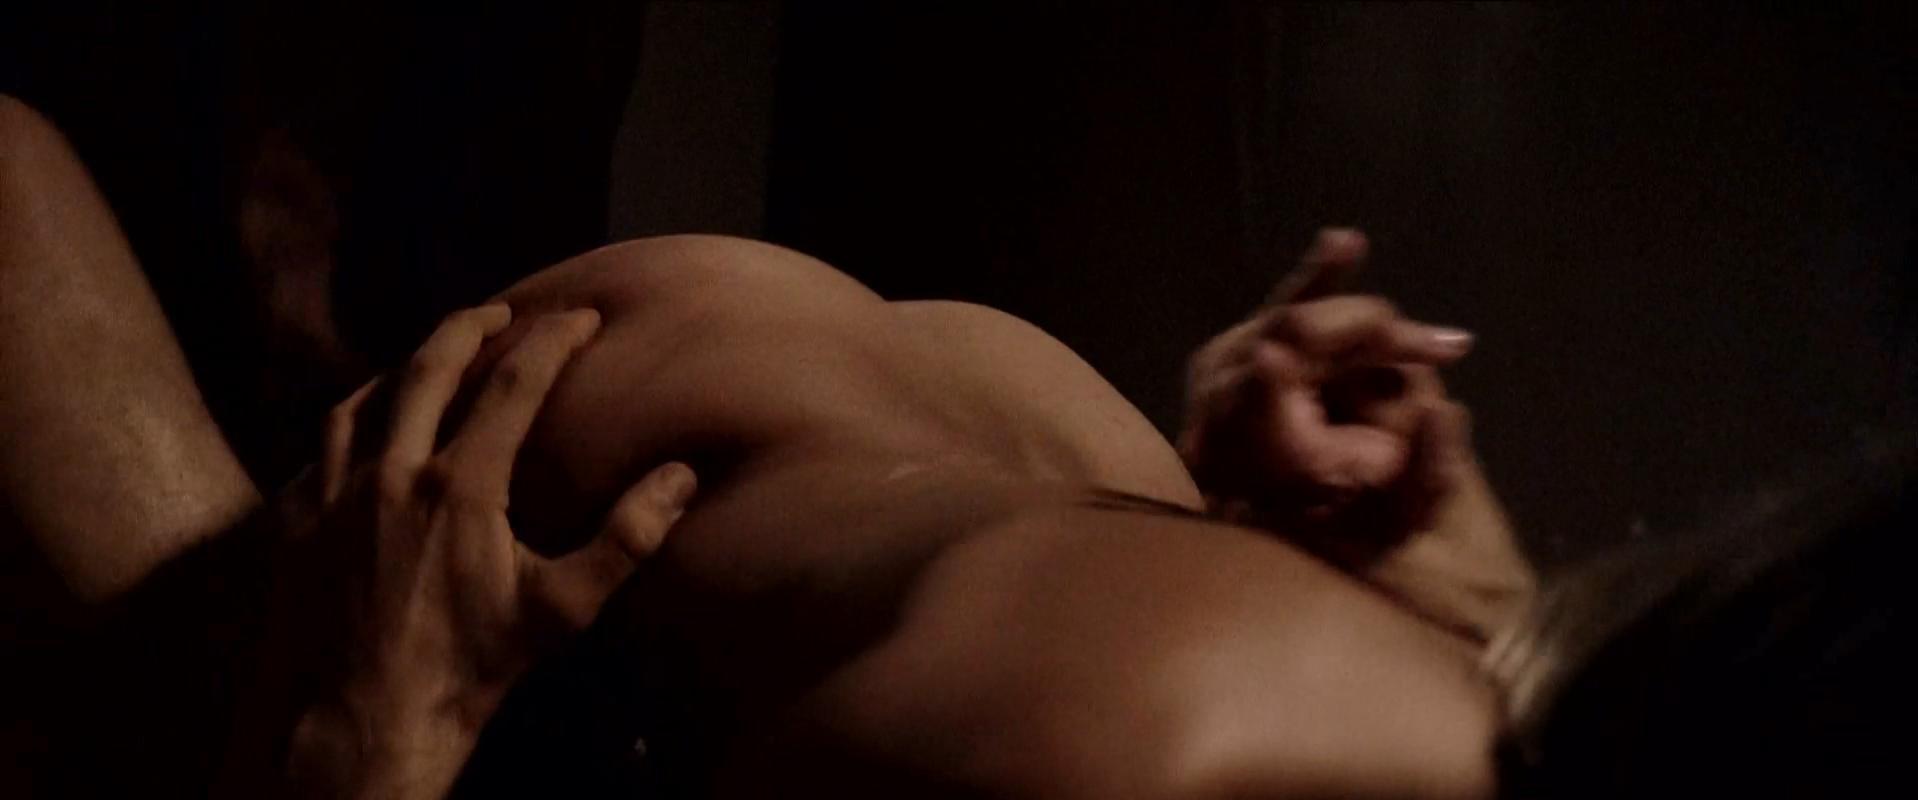 Anna Mucha nude - Pitbull. Nowe porzadki (2016)